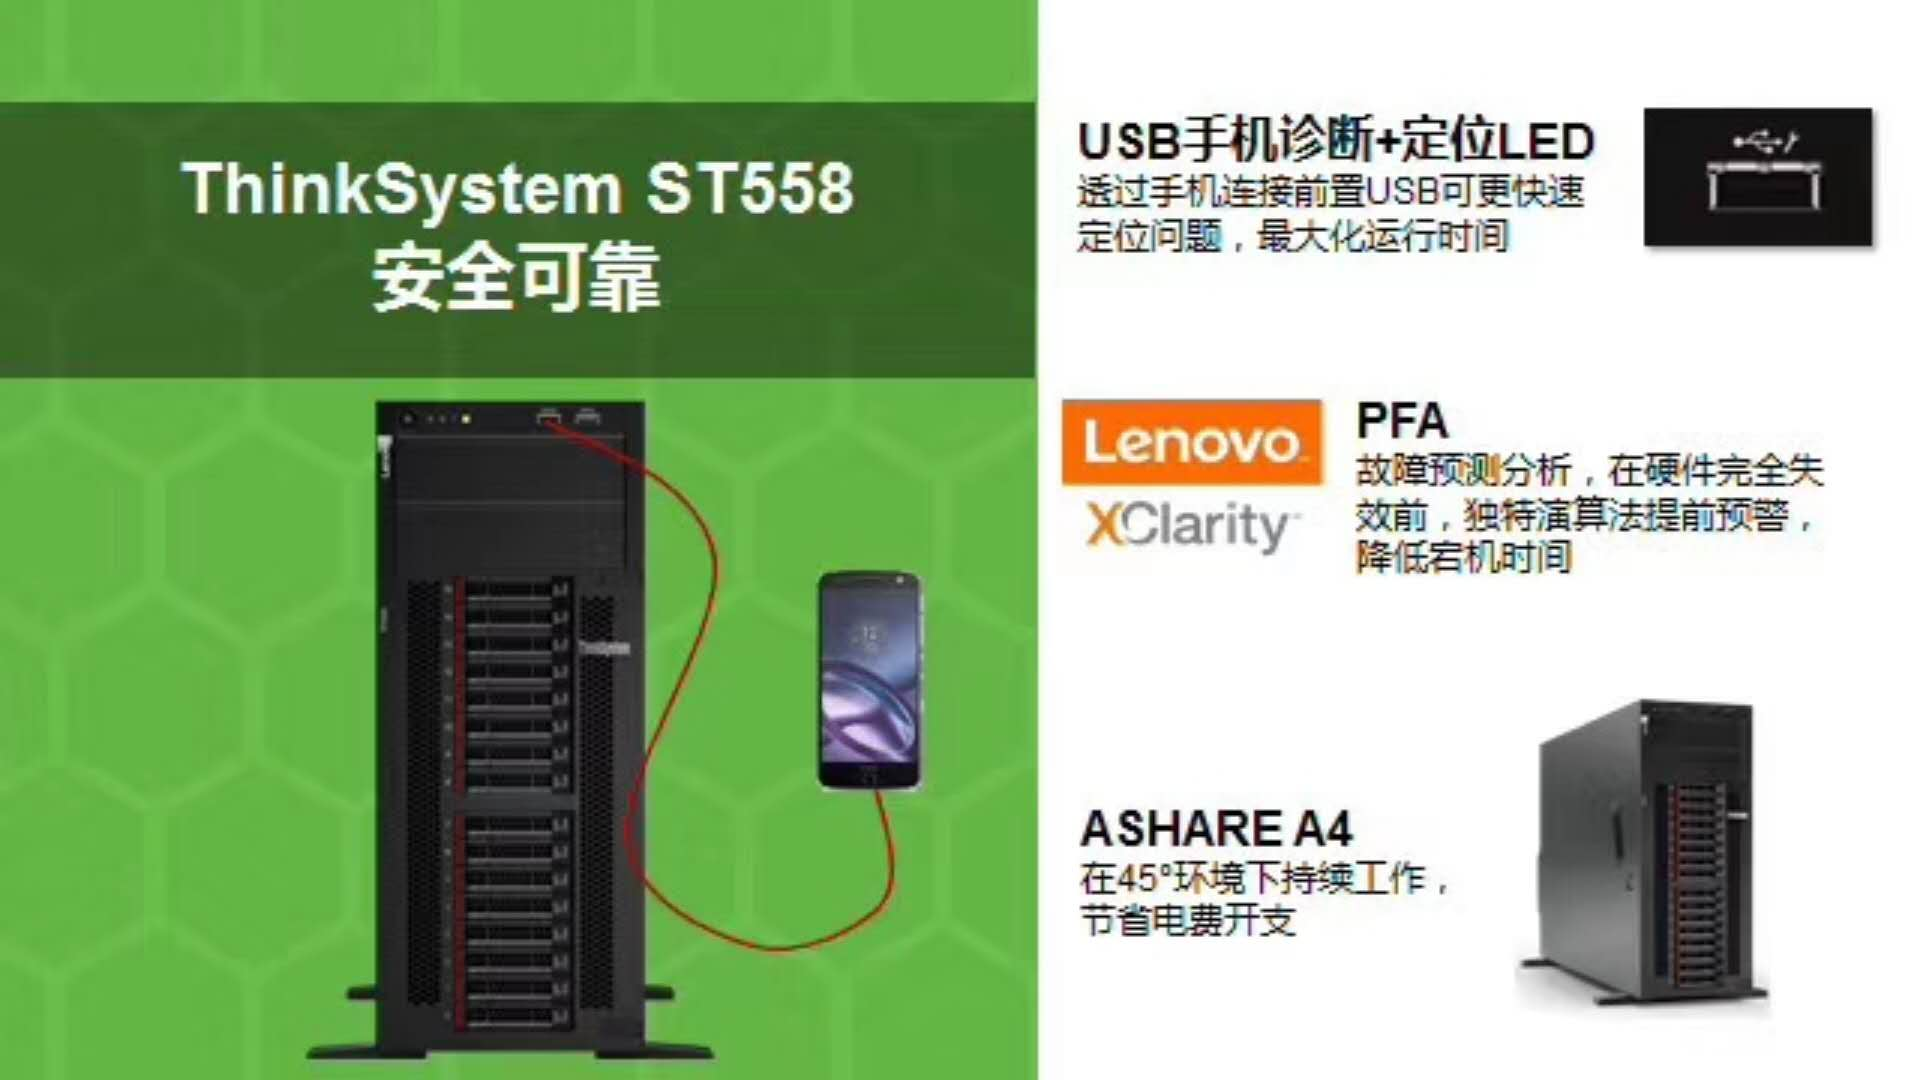 联想 Thinksystem ST558售价12900元